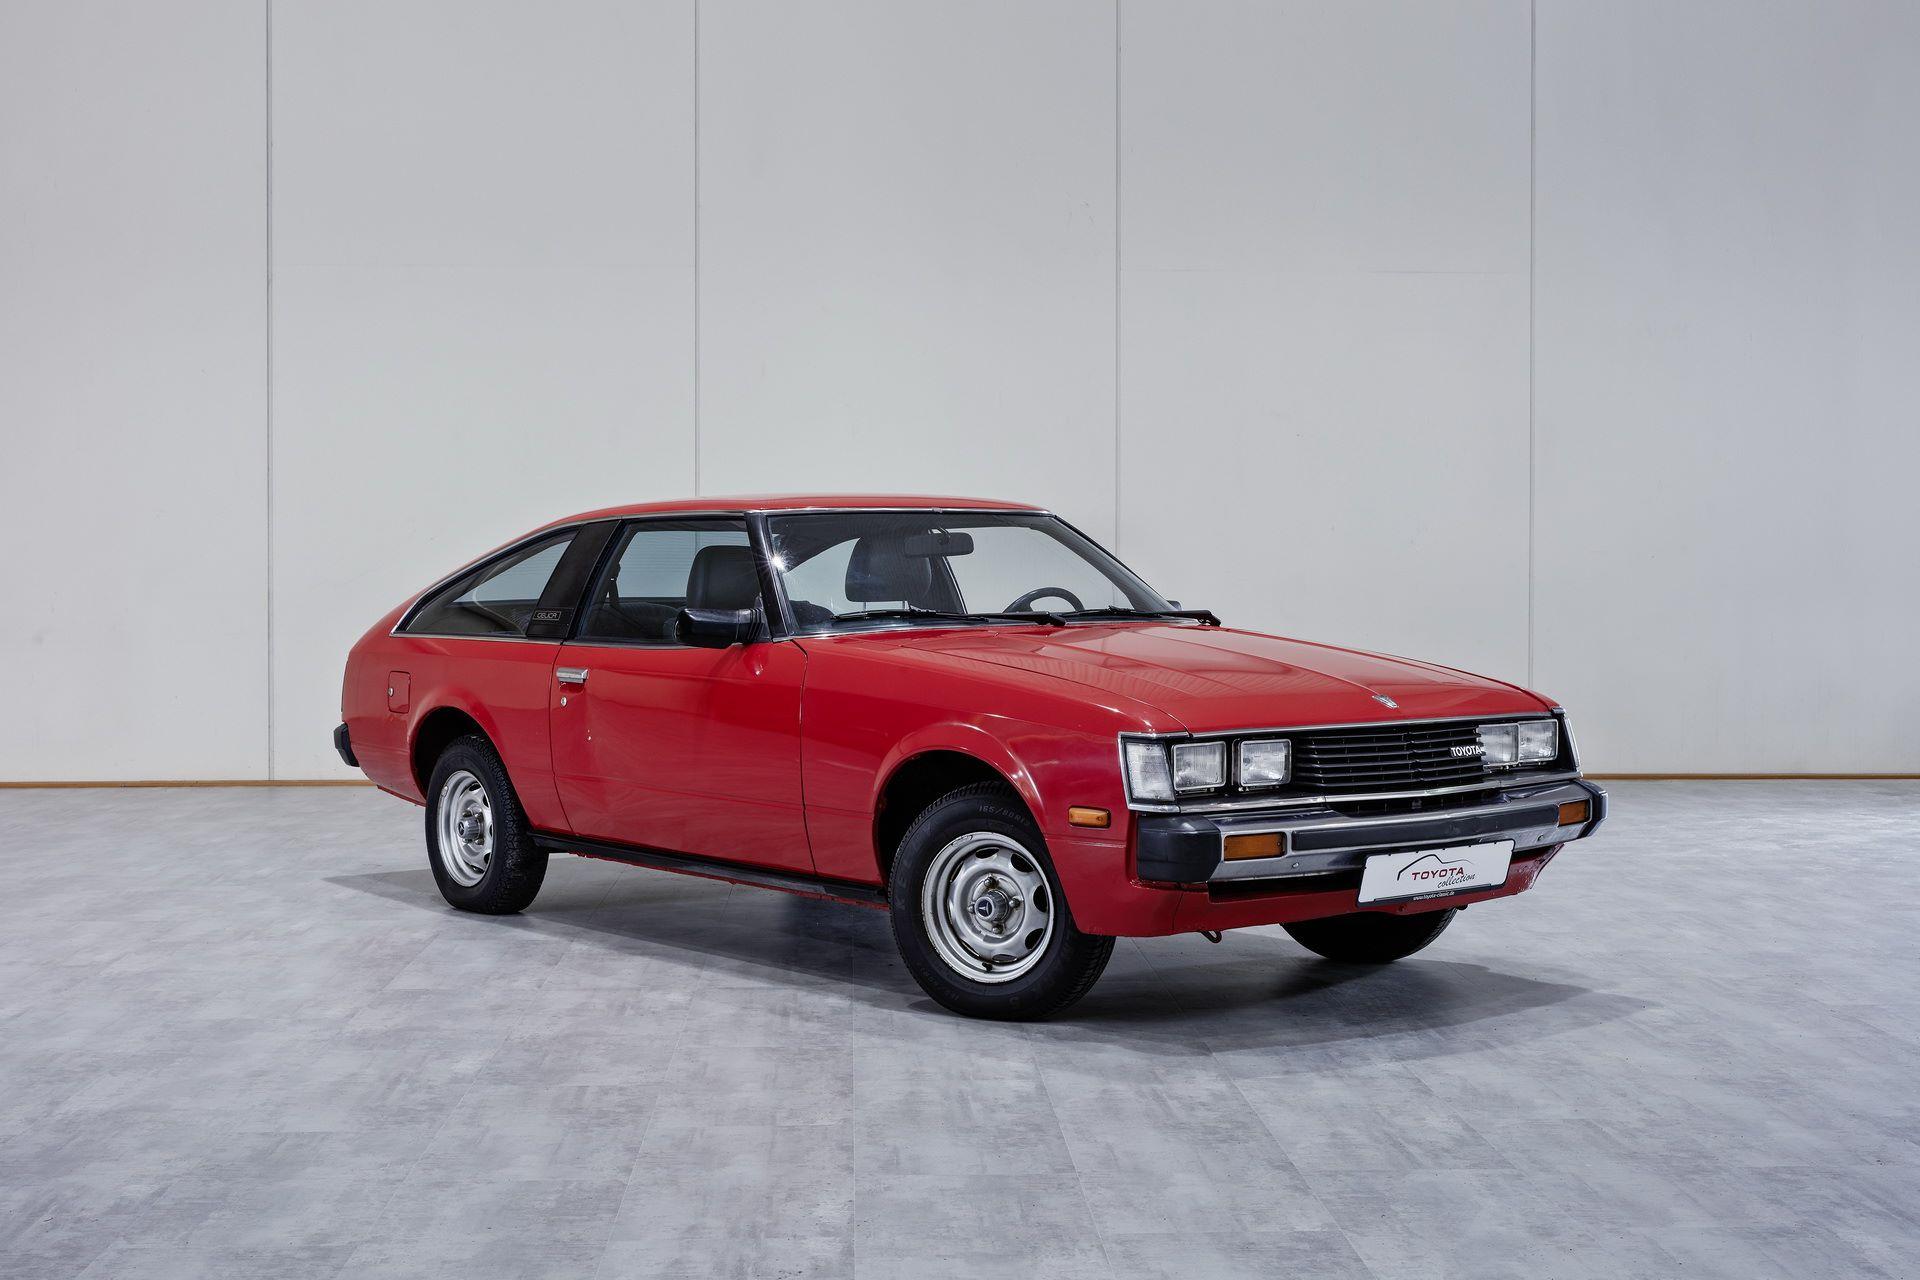 Toyota-Celica-50-years-7